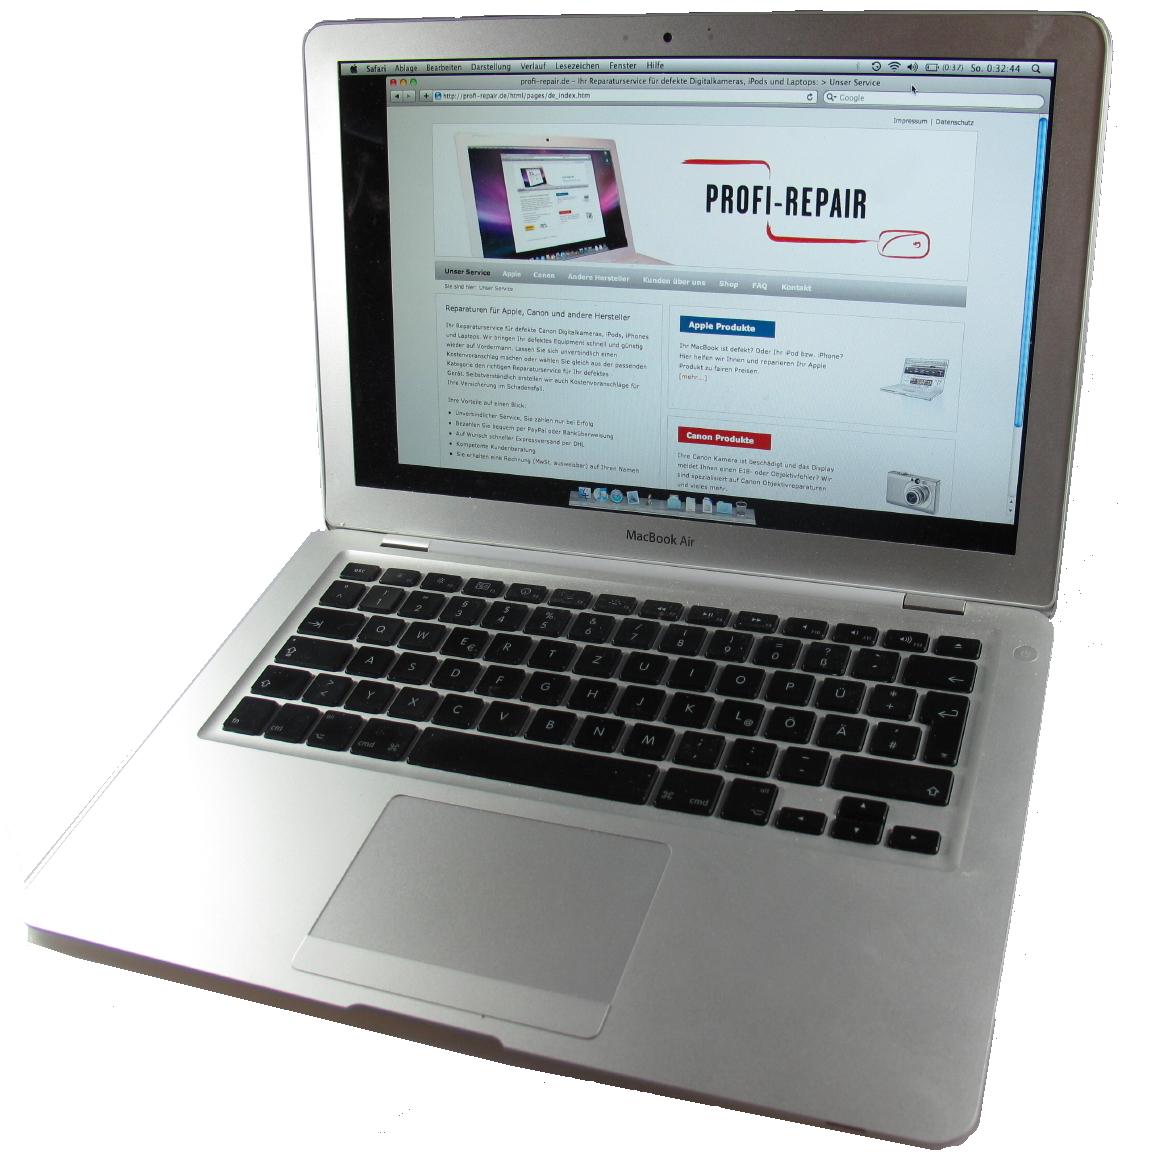 macbook pro unibody 17 display reparatur macbook display. Black Bedroom Furniture Sets. Home Design Ideas